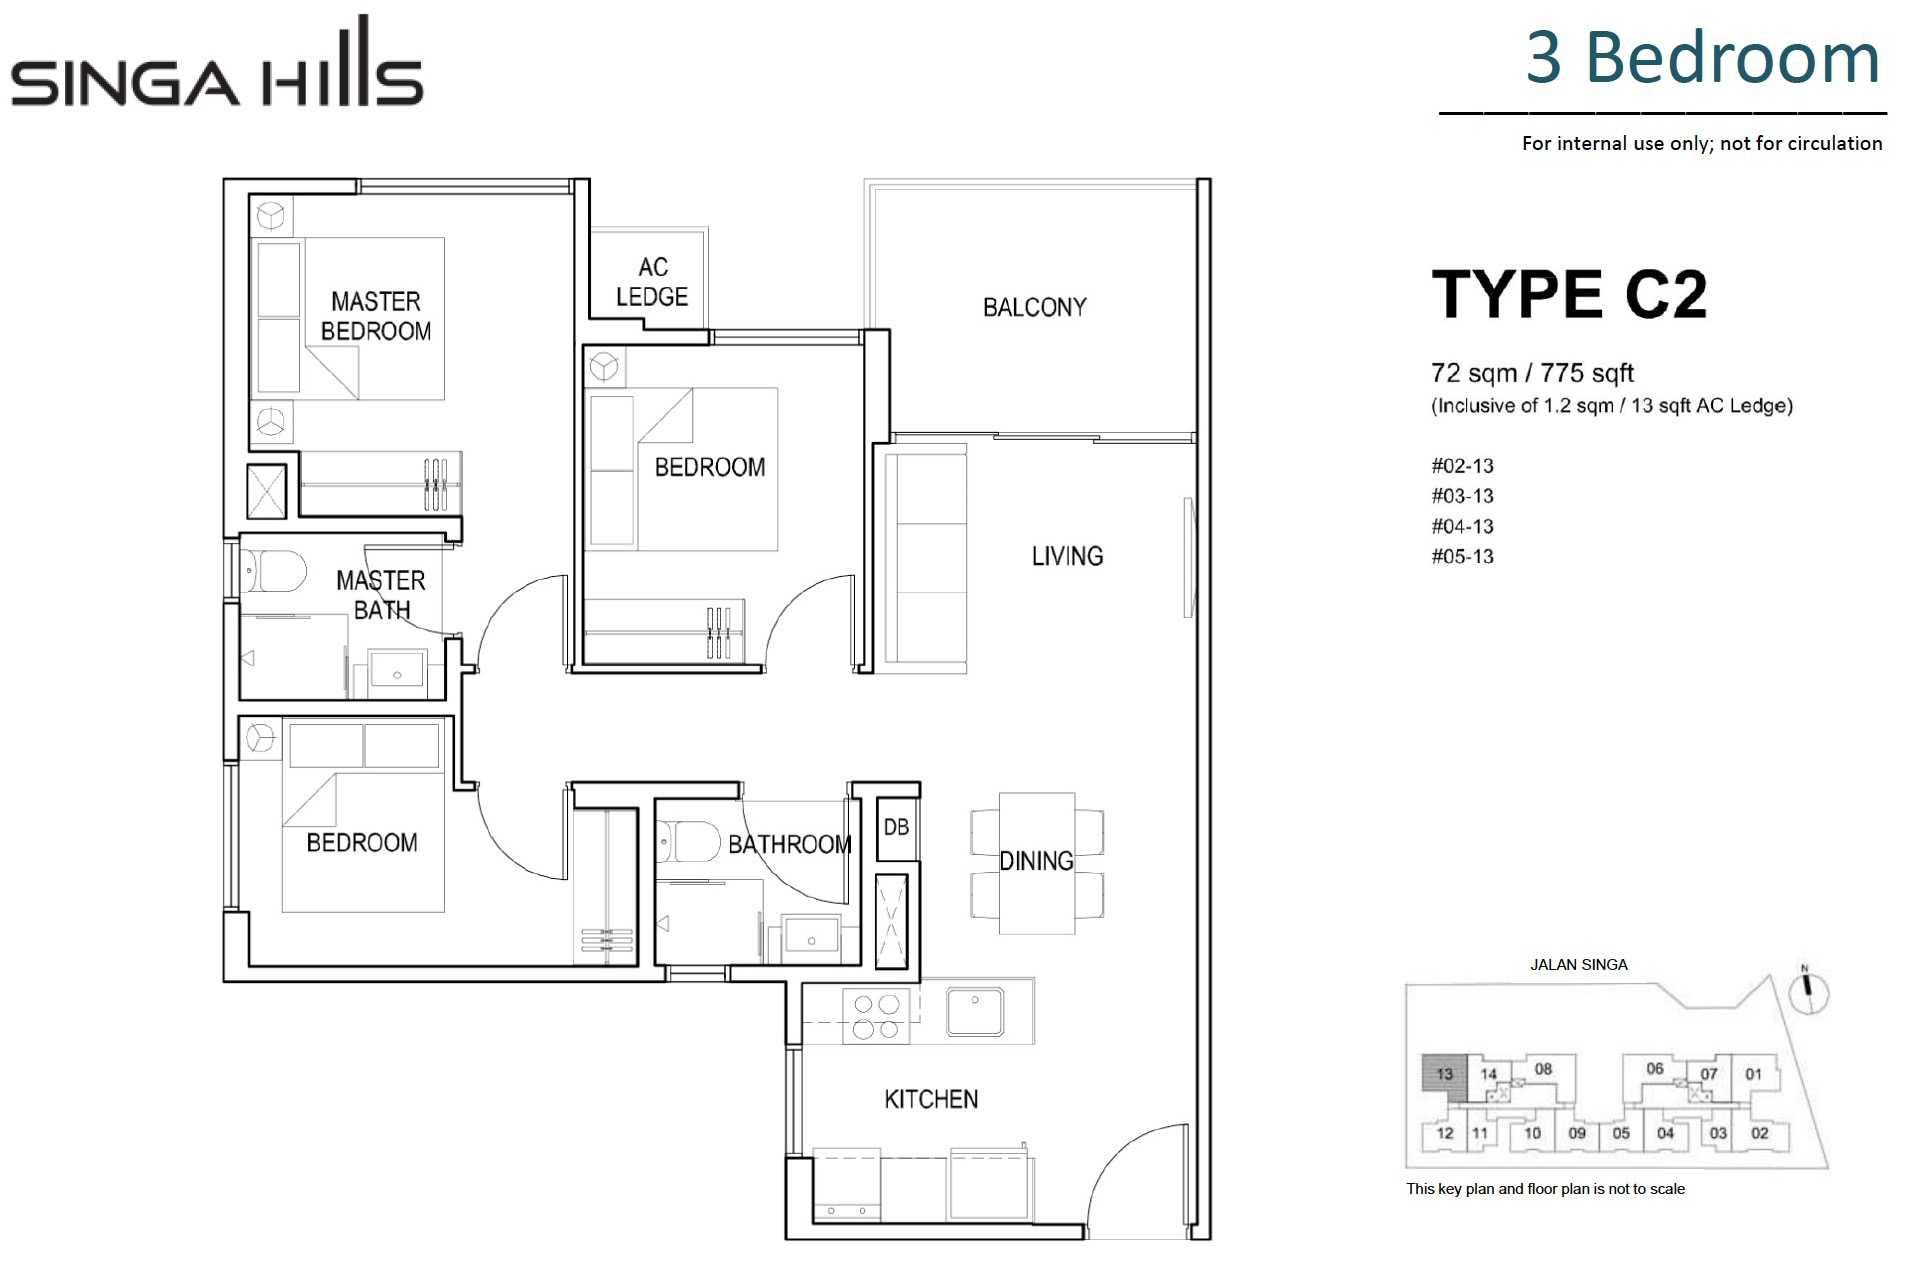 singa-hills-floor-plan-3BR-C2